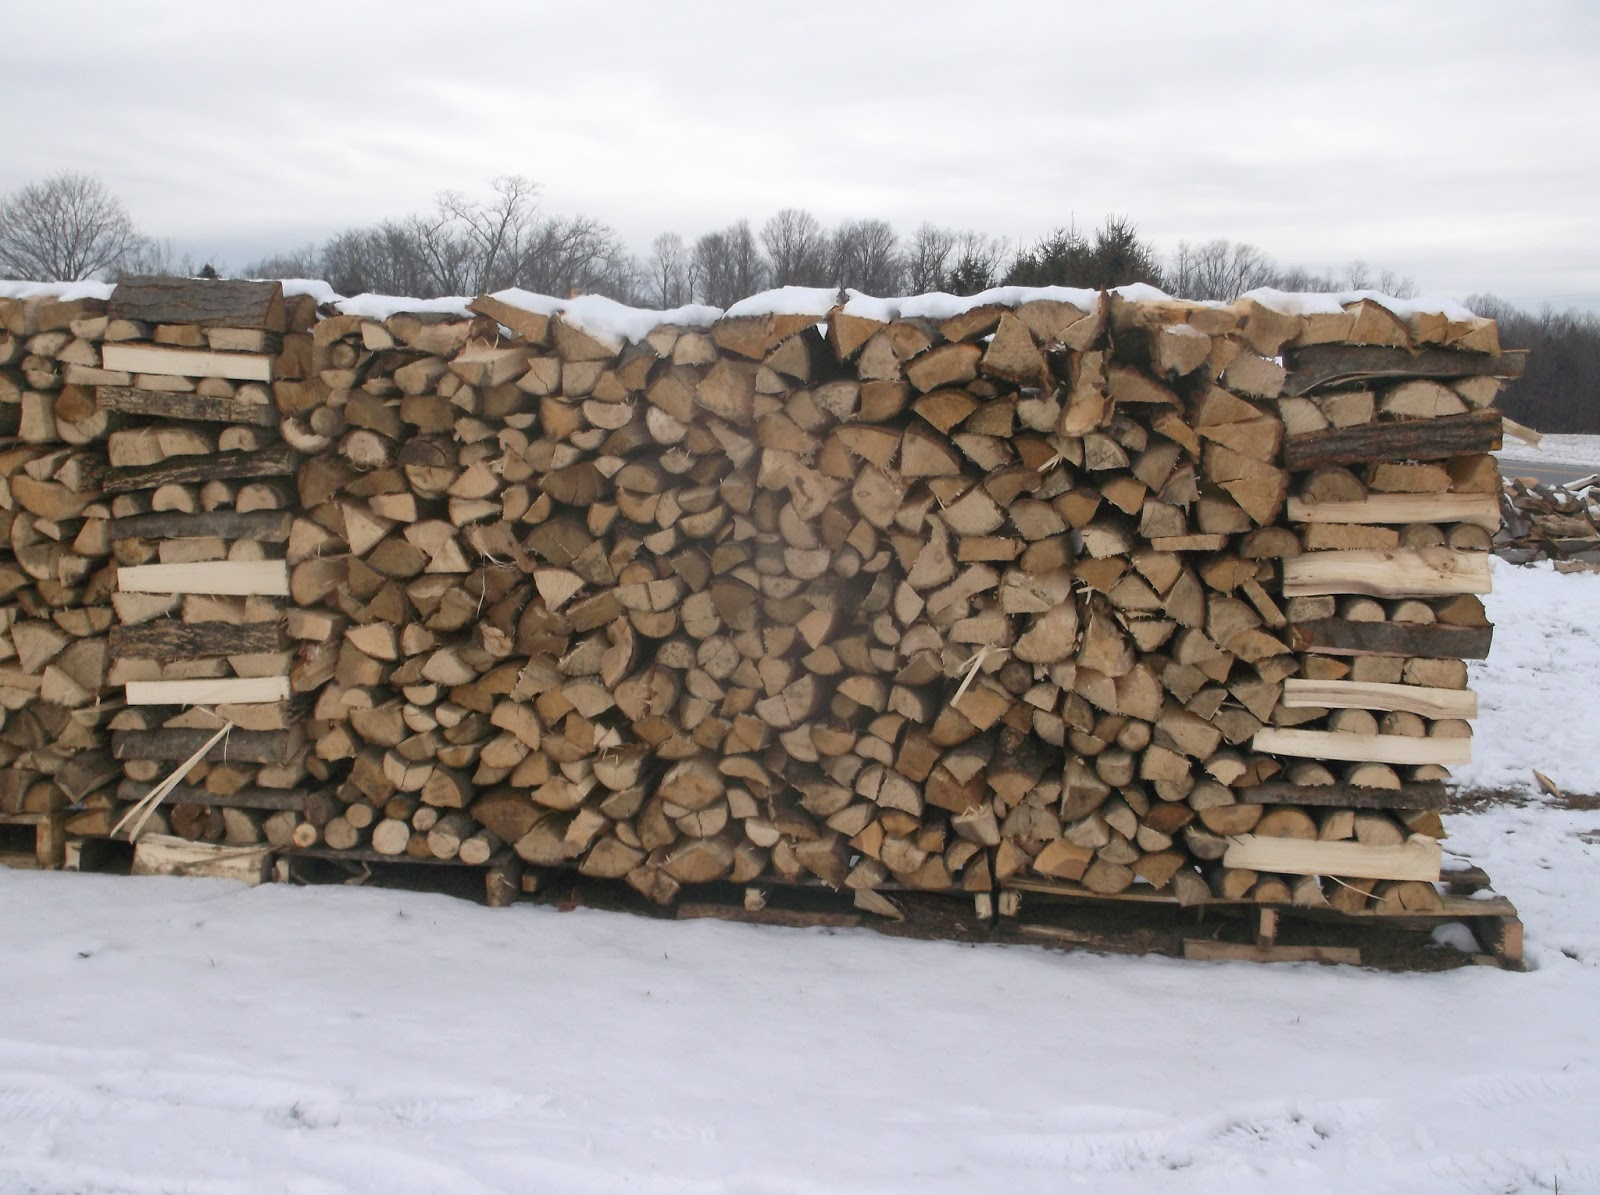 Bryk city landscaping firewood